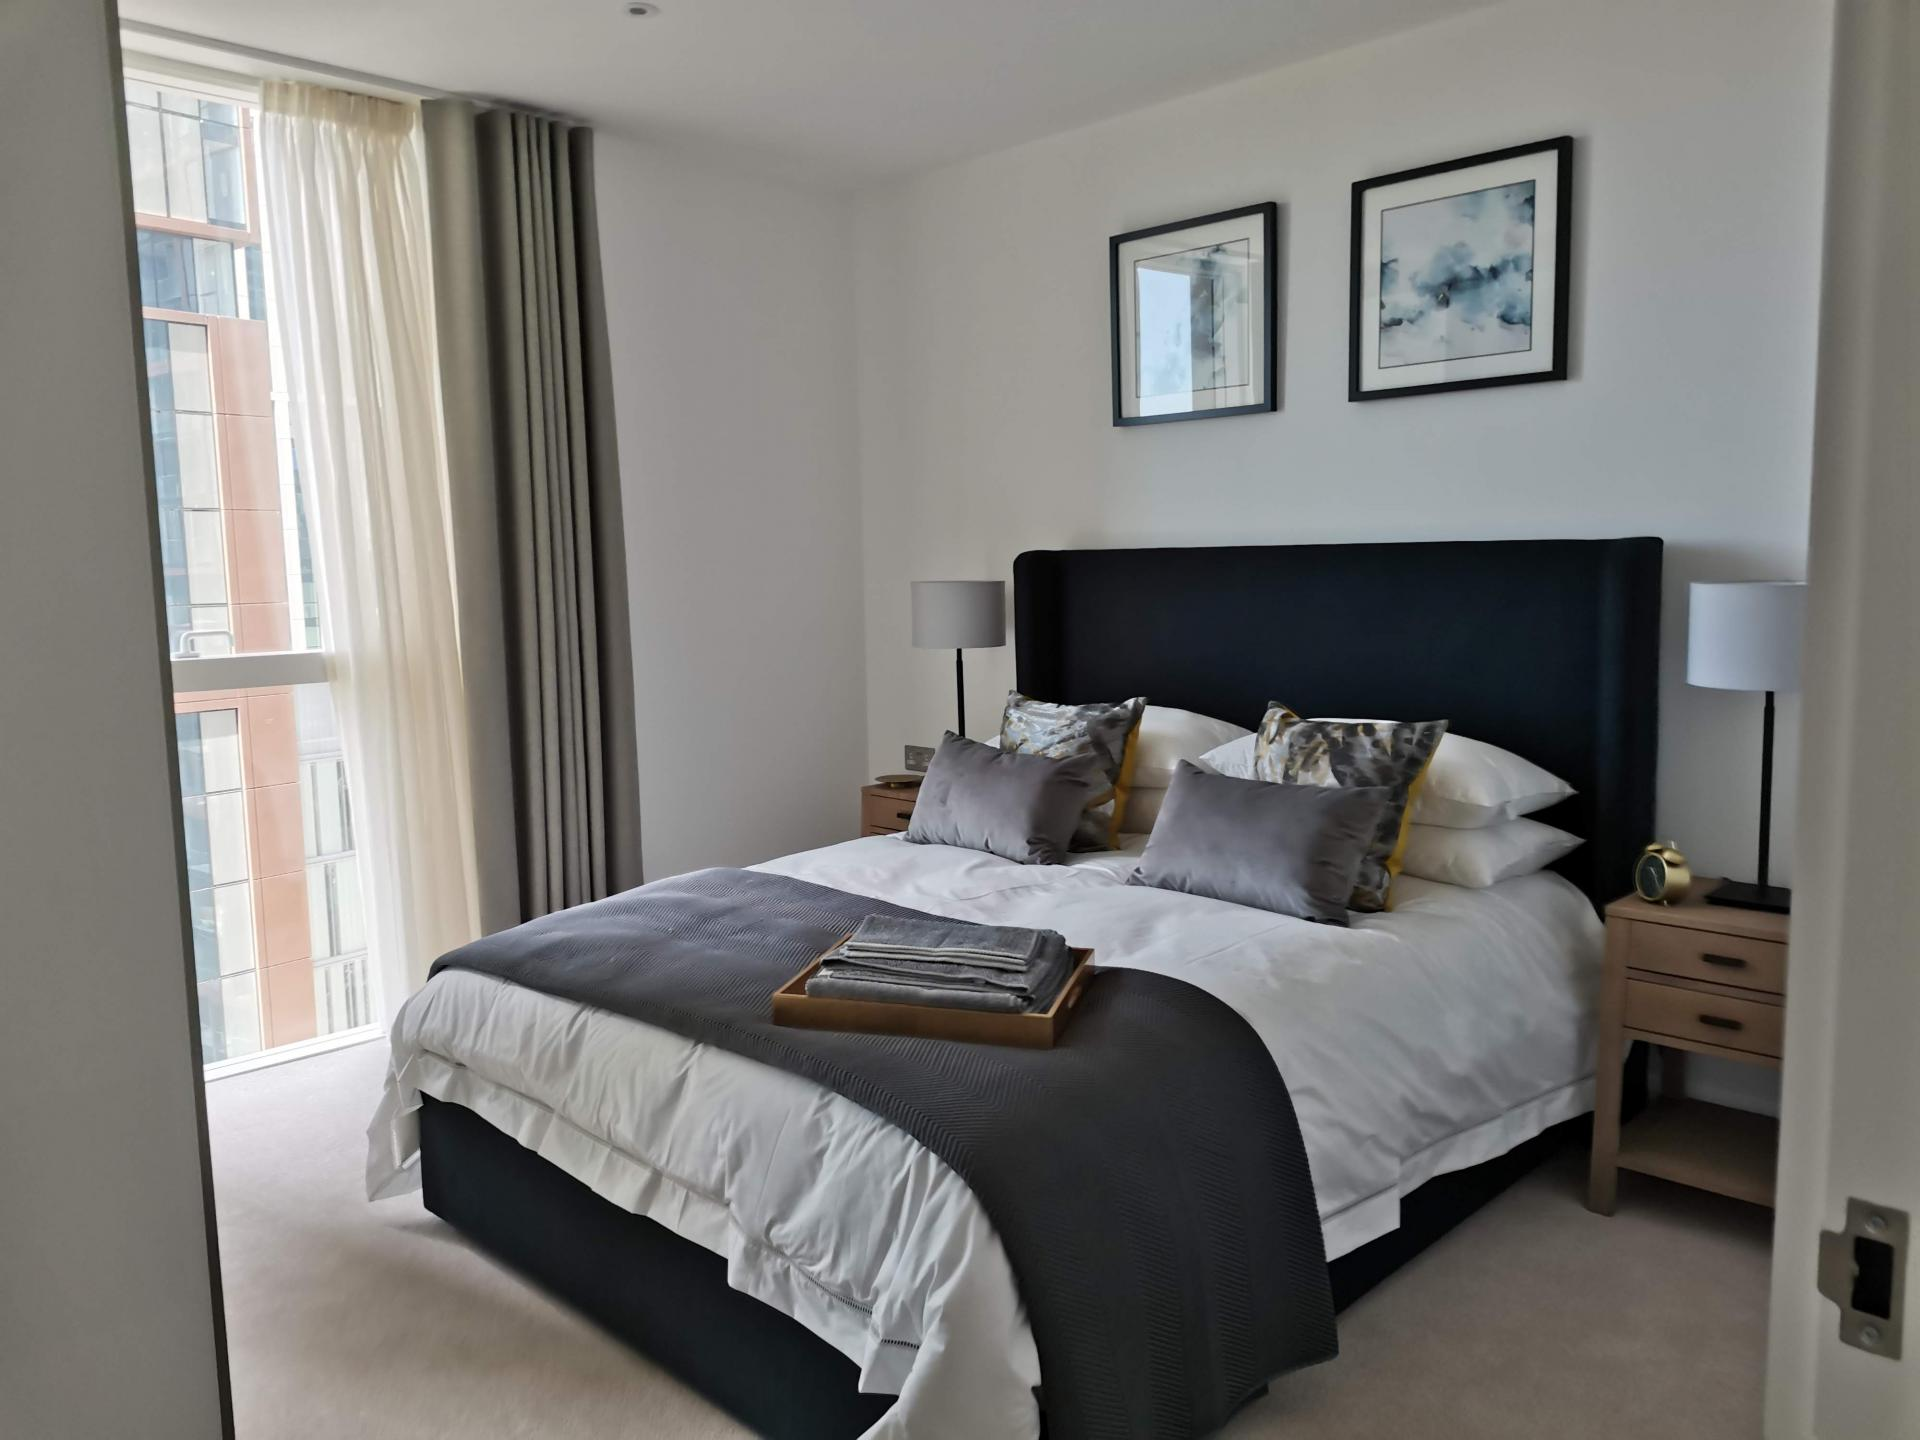 Bedroom at Charles Hope Canary Wharf, Canary Wharf, London